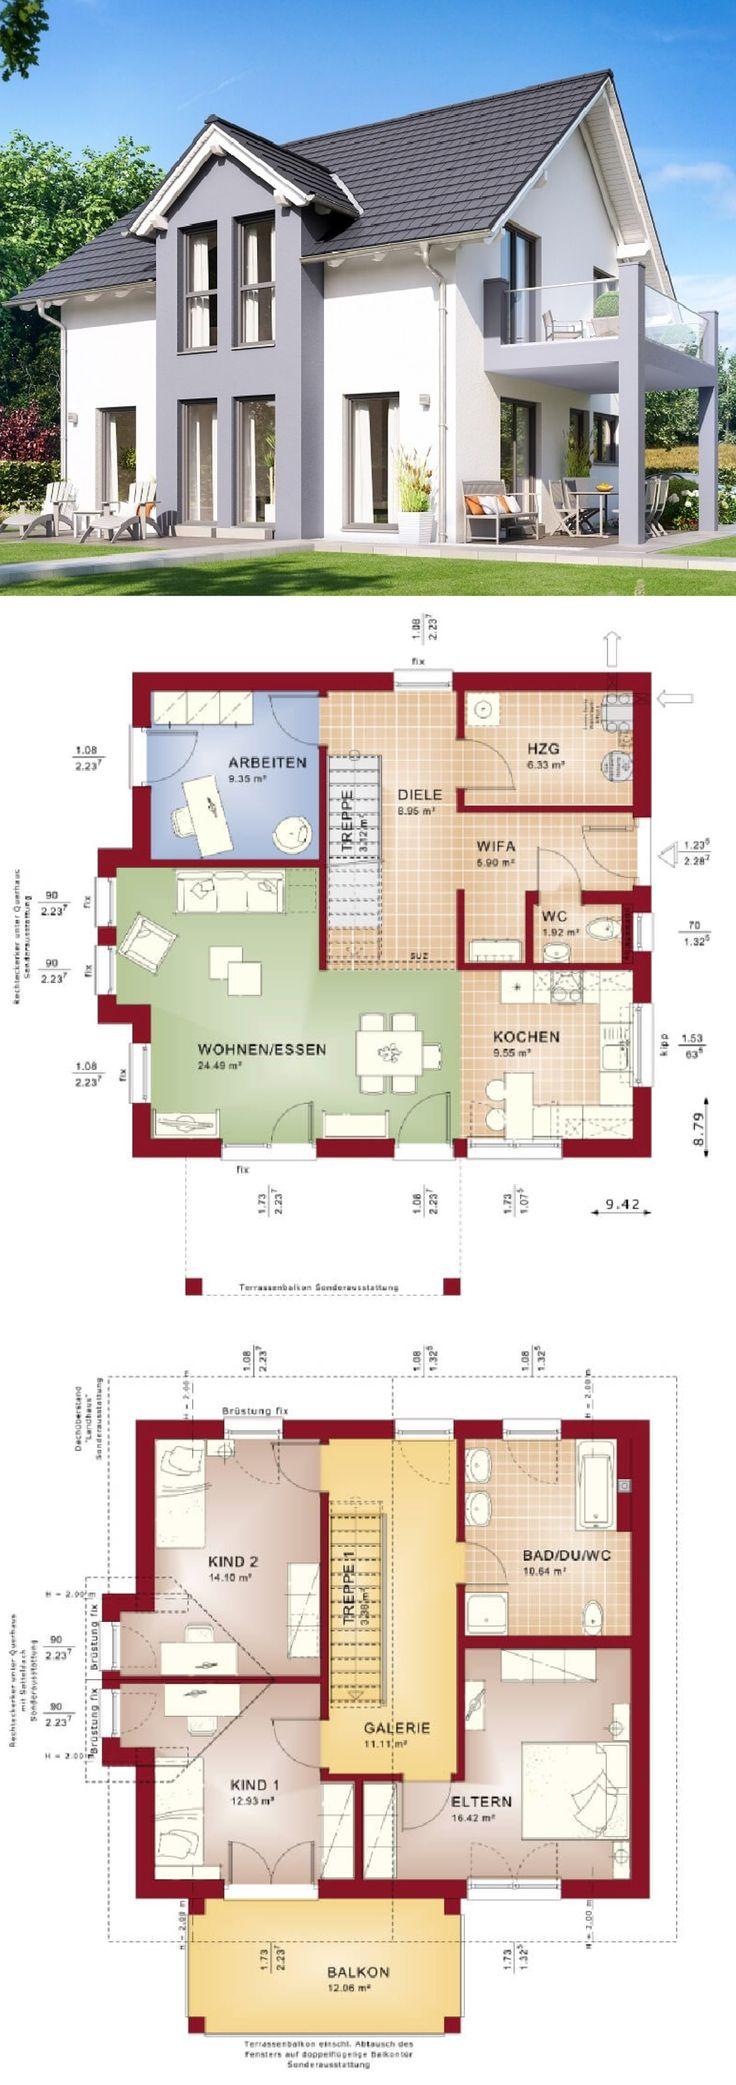 Hausbaufirmen In Brandenburg 1637 best hausbaudirekt images on architectural drawings